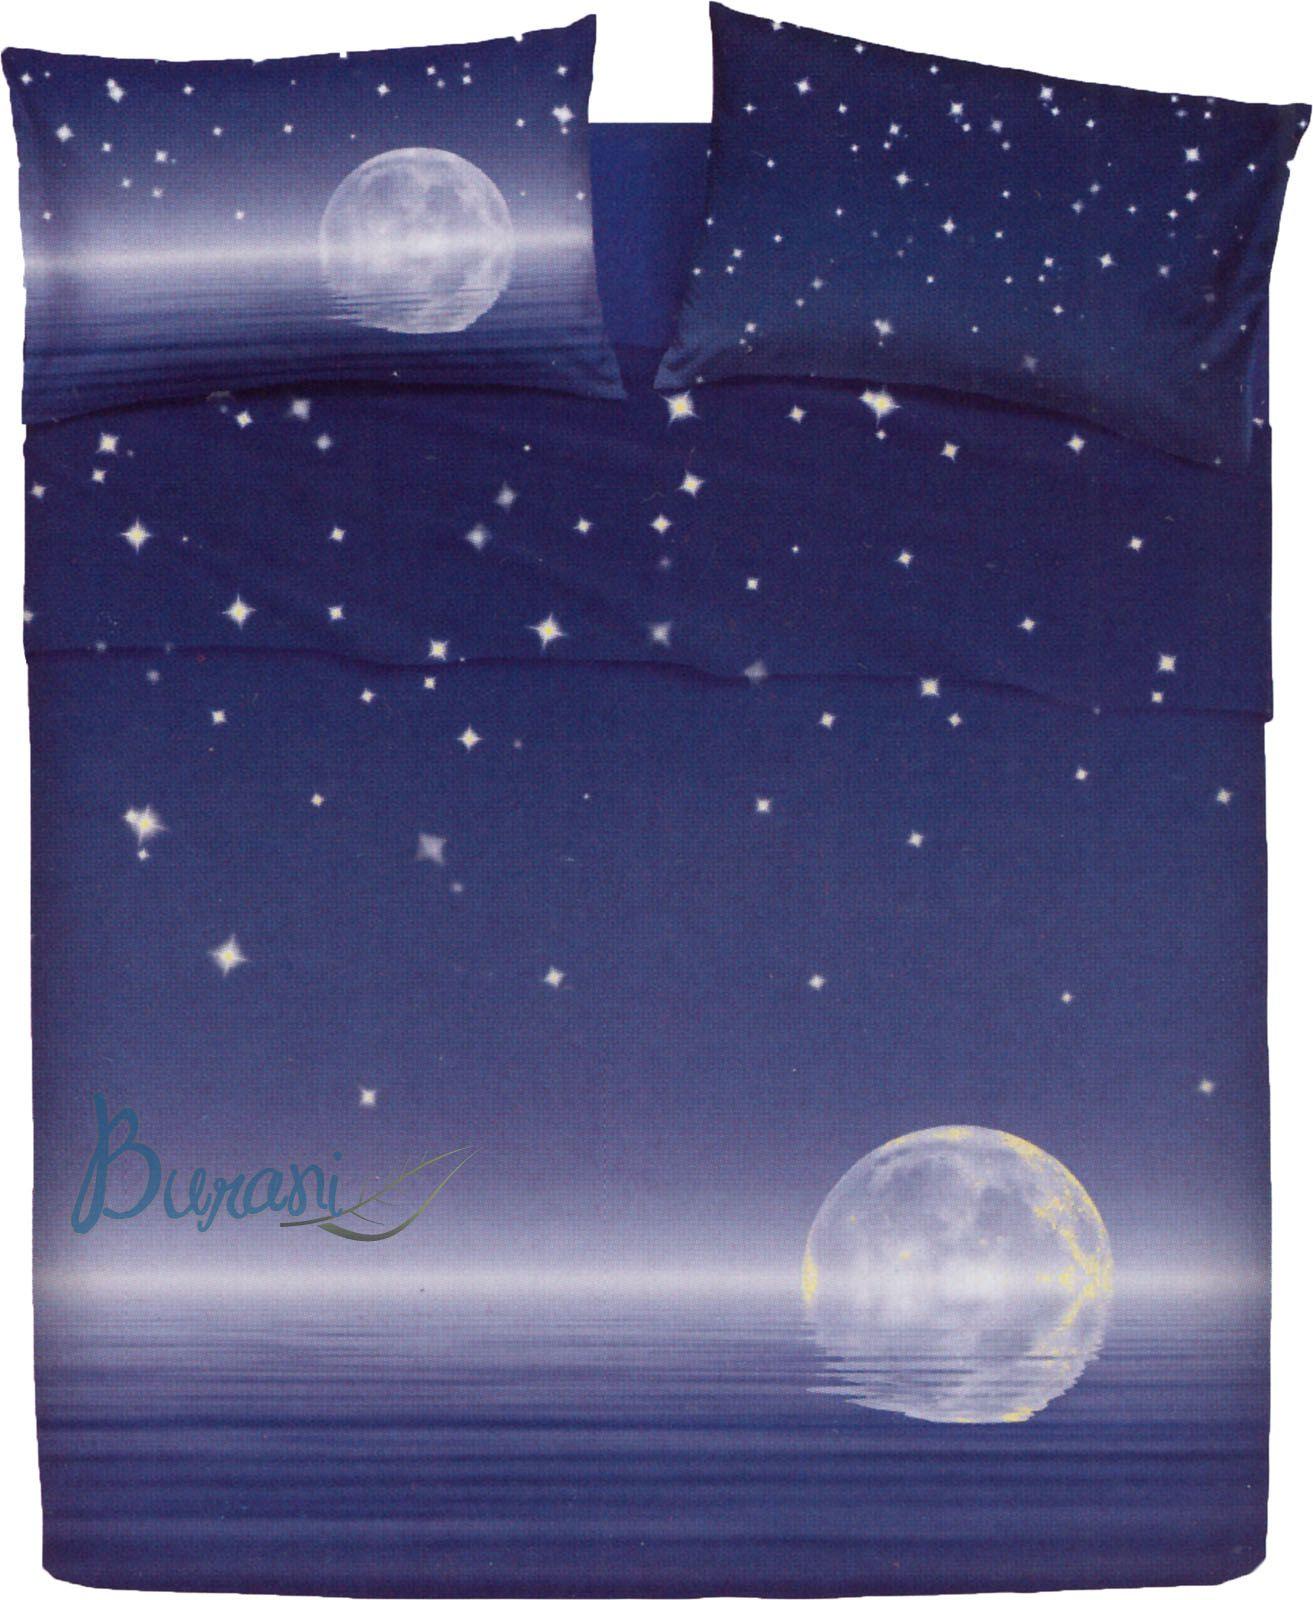 Lenzuola Matrimoniali Bassetti New York.Magic Moon Bassetti Le Stelle Si Illuminano Al Buio Celestial Celestial Bodies Outdoor